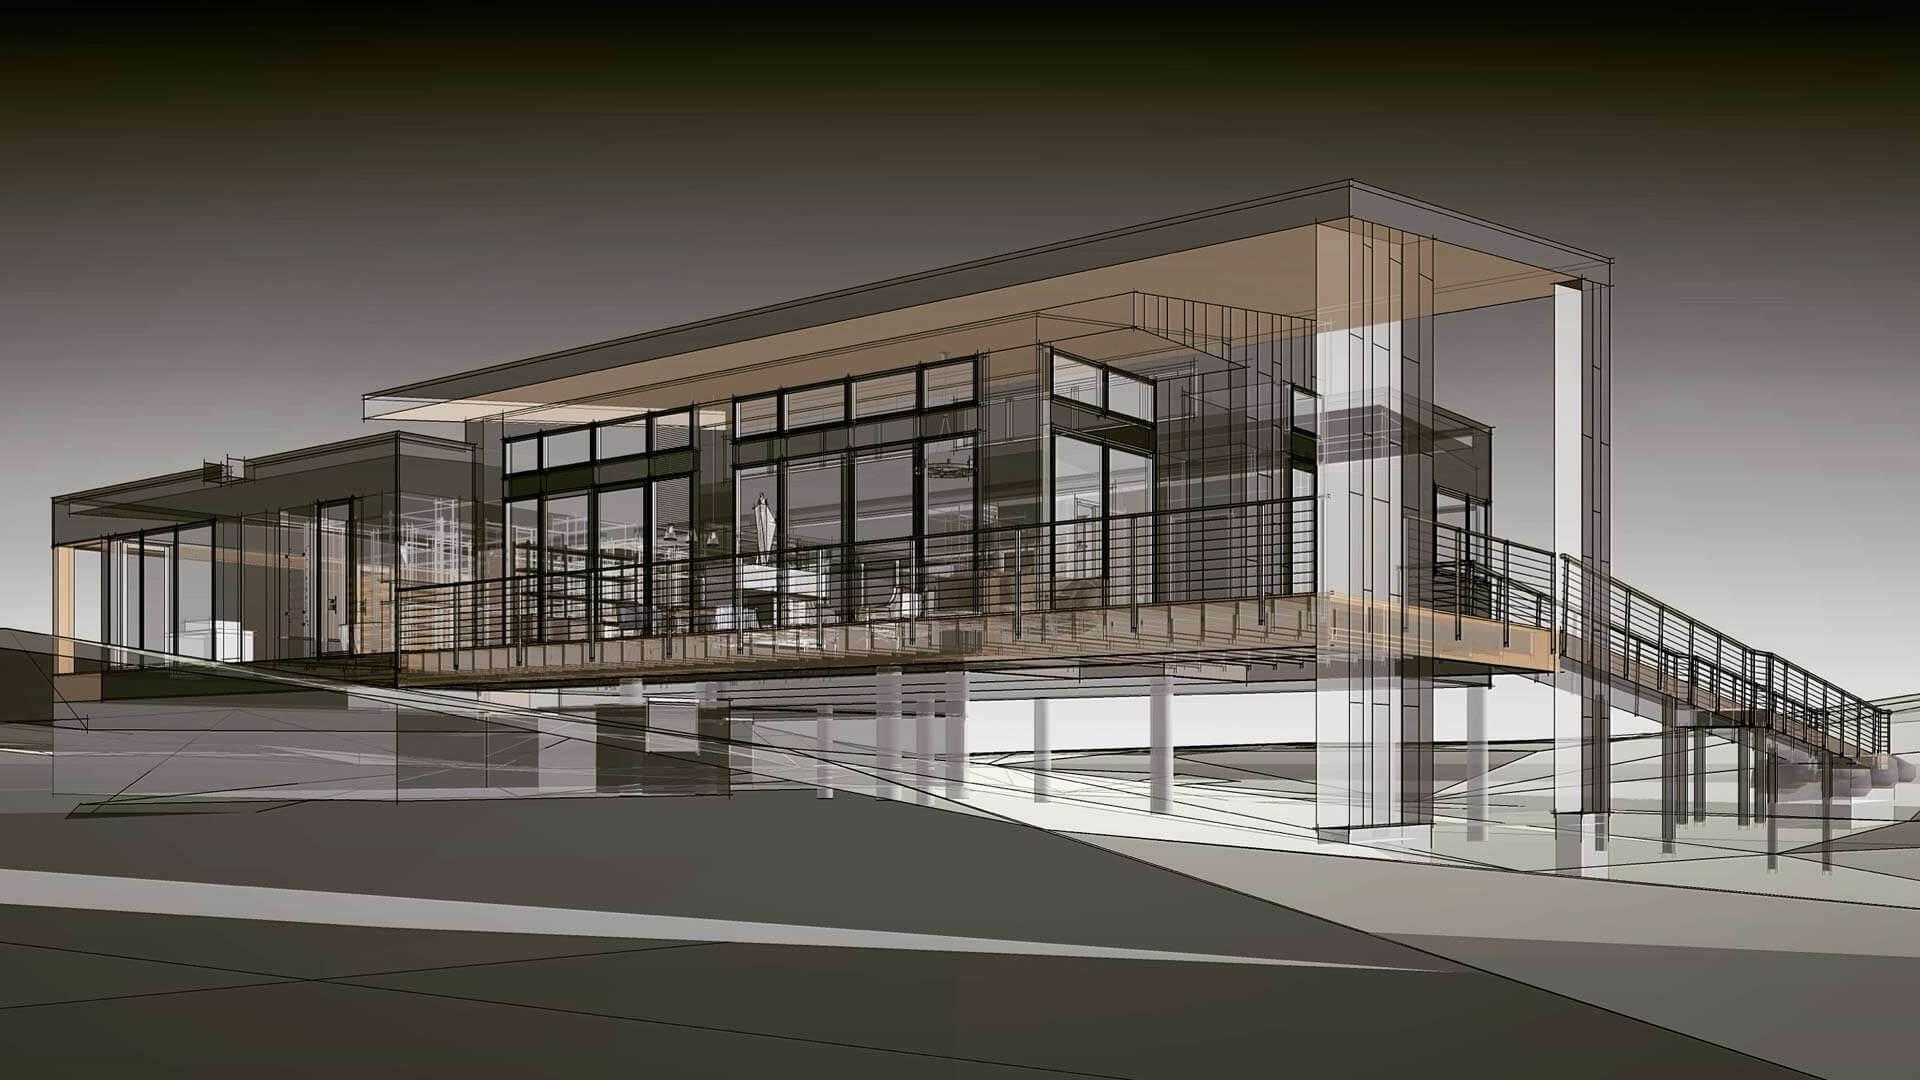 Bridge House, North Elevation, Douglas, Michigan - Lake Michigan - HAUS   Architecture For Modern Lifestyles, Christopher Short, Indianapolis Architect, Tom Rigney, TR Builders